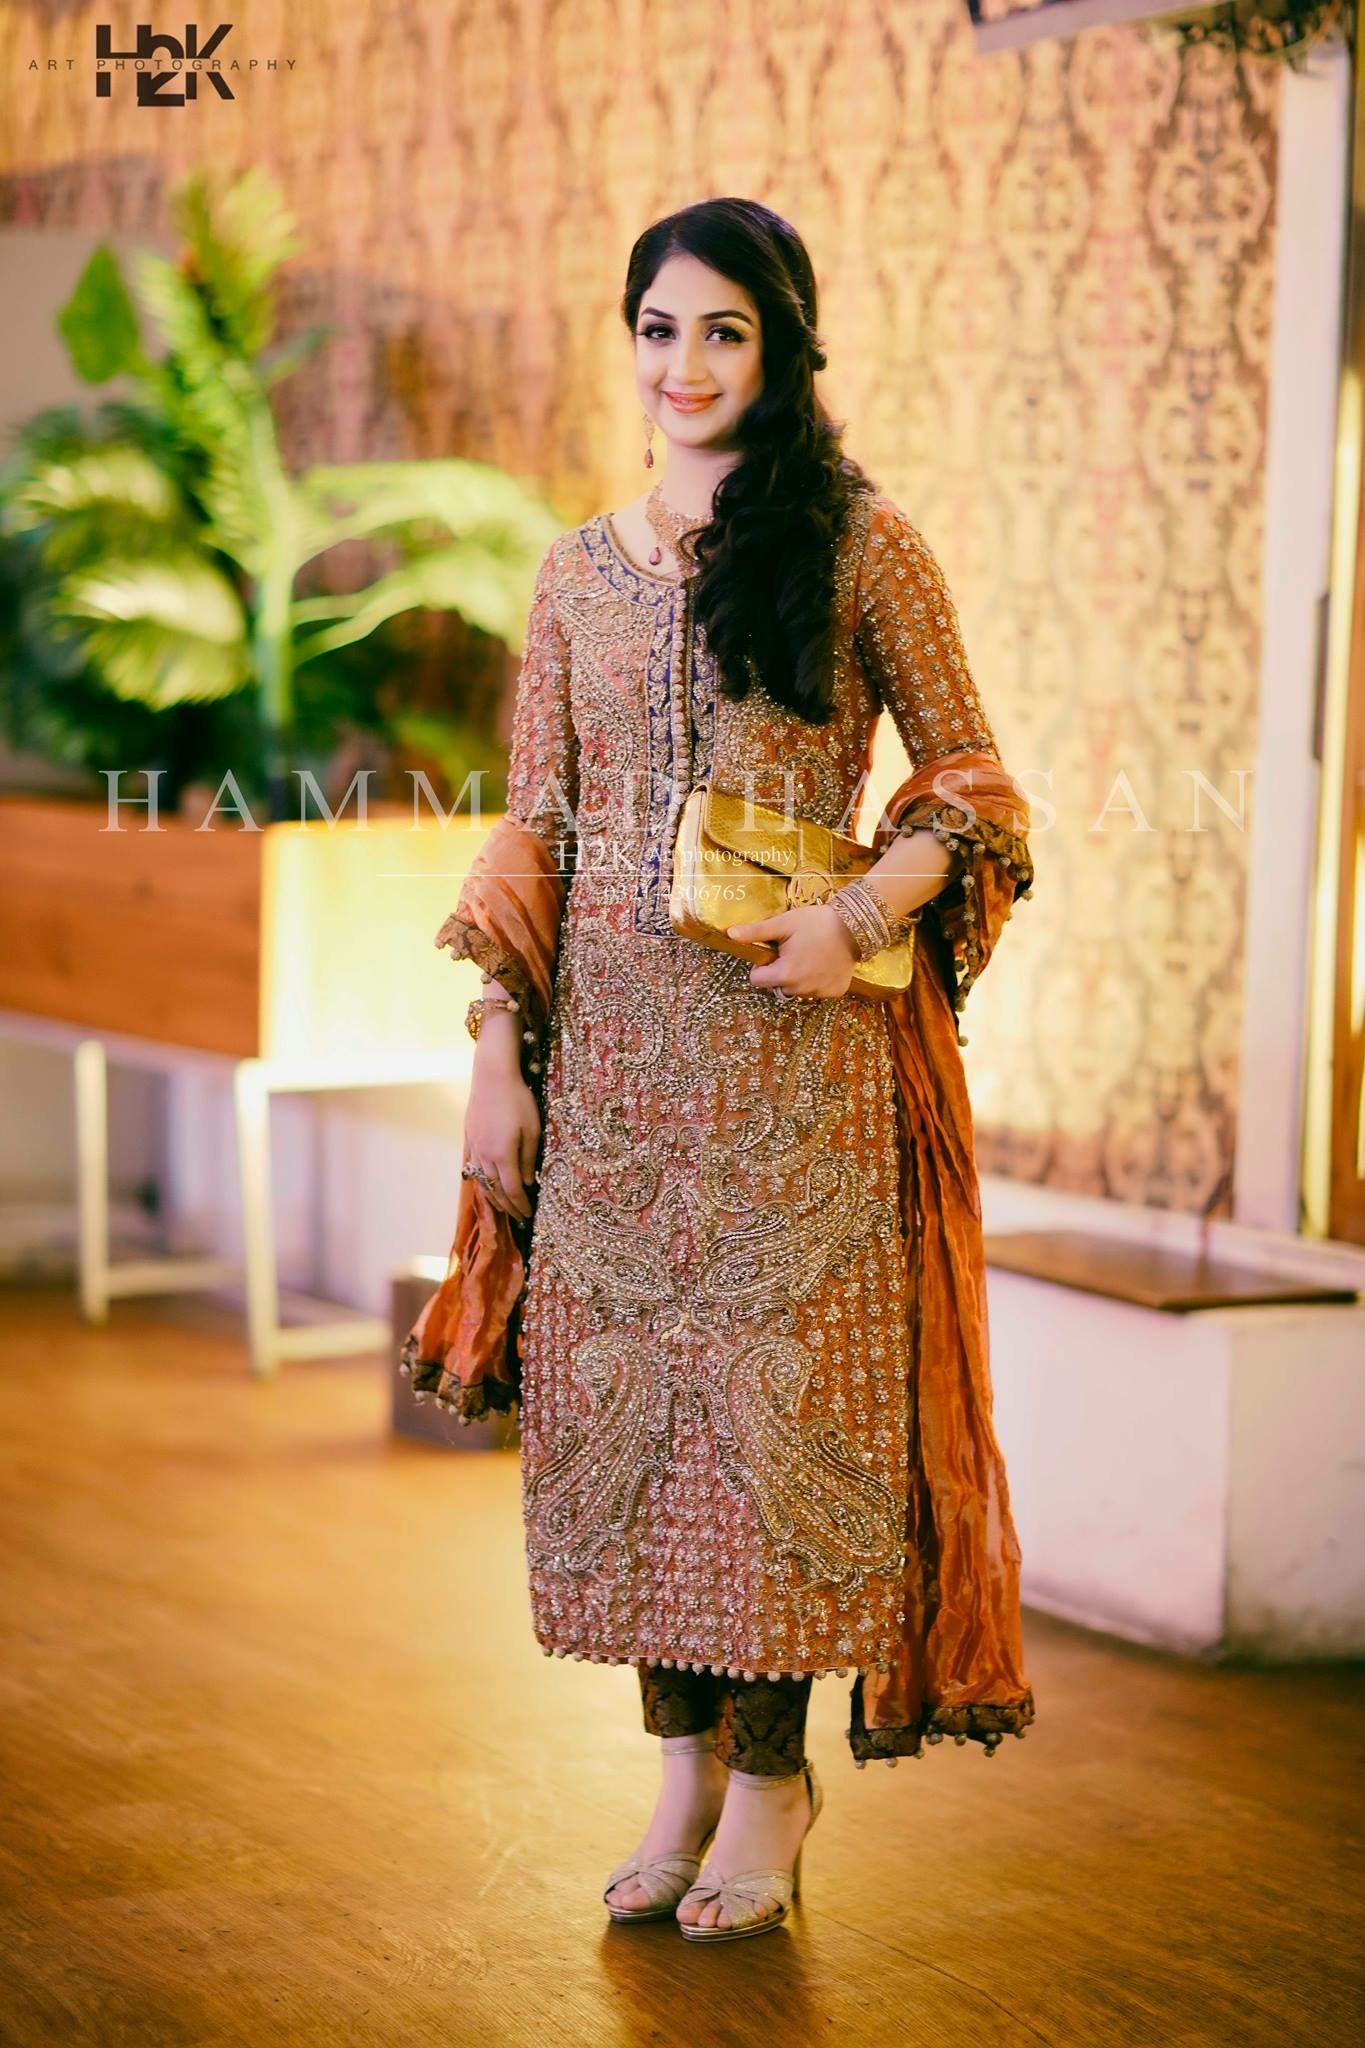 ee1ab64207d1 Pin by MahiMahi on Desi Dresses!!! in 2019